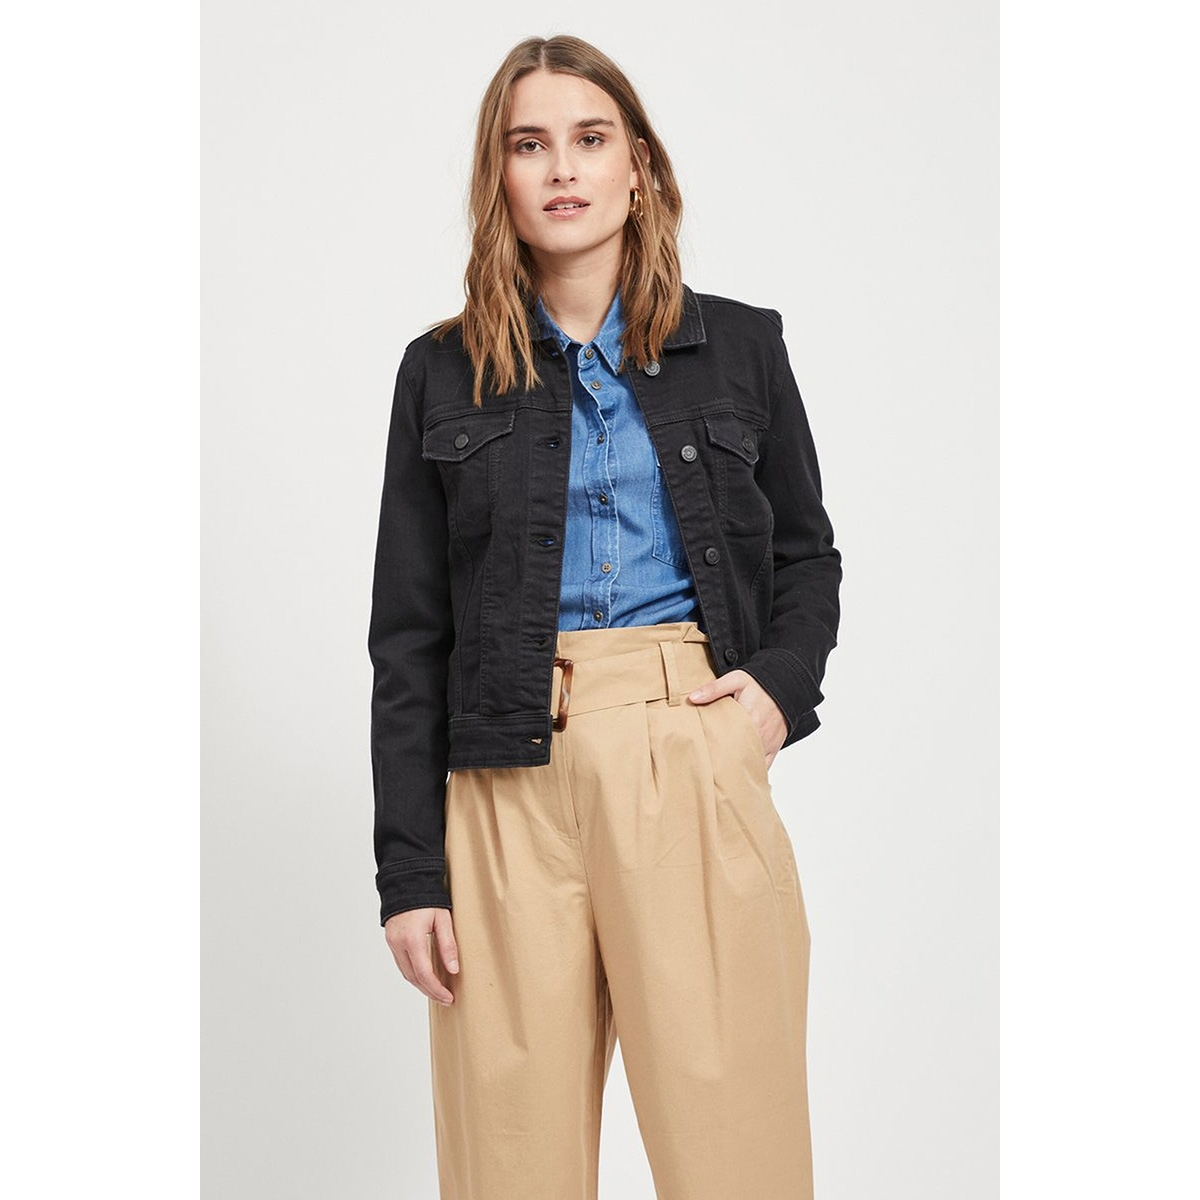 objwin new  denim jacket noos 23026129 object jas black denim